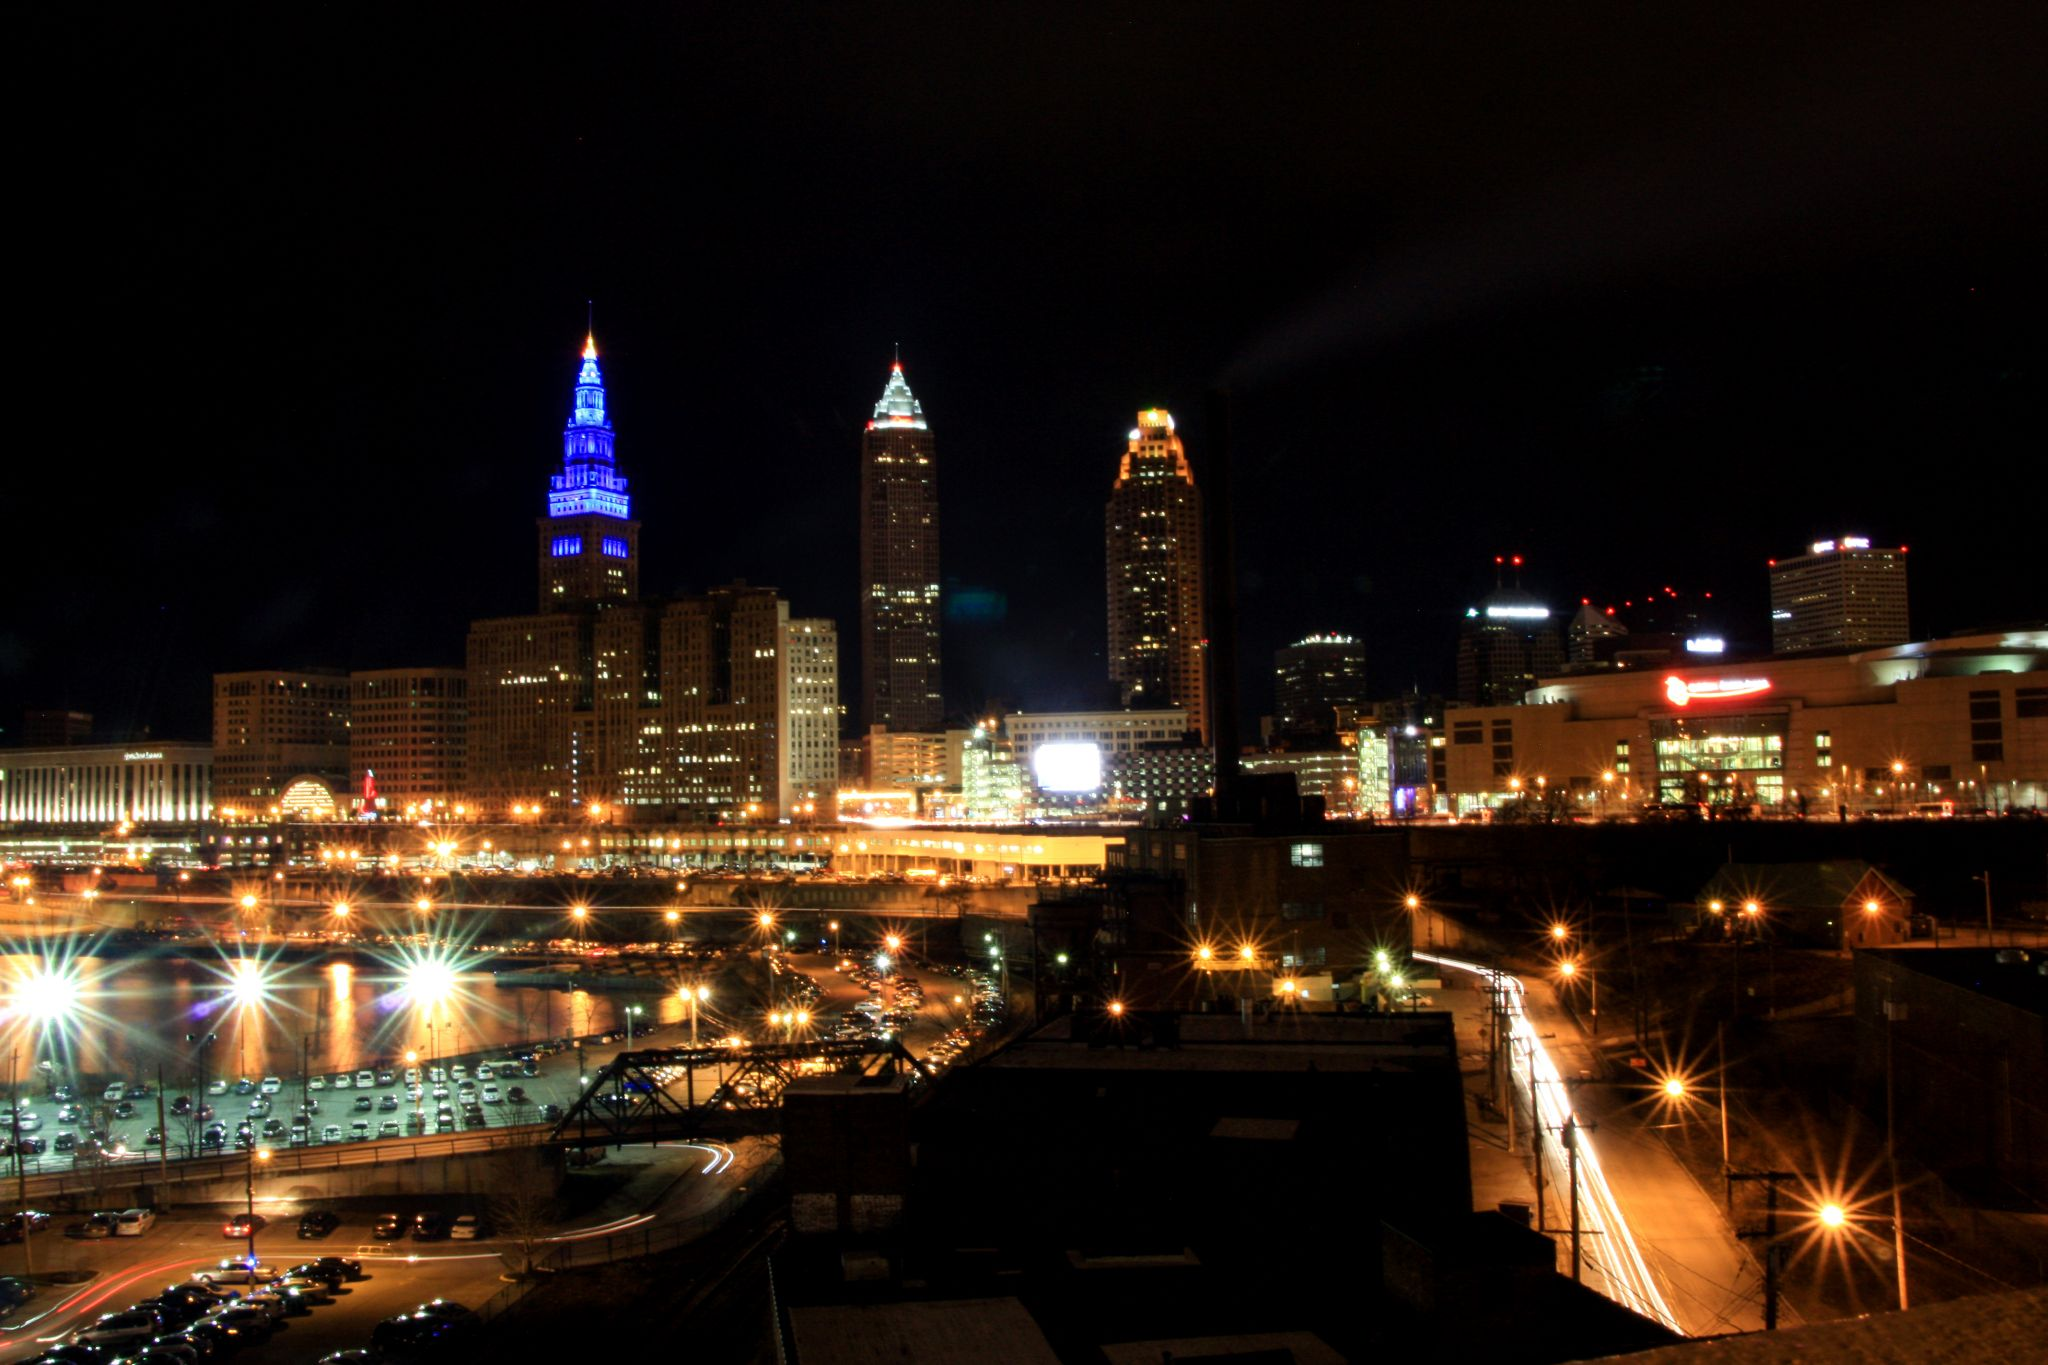 Cleveland Downtown, USA